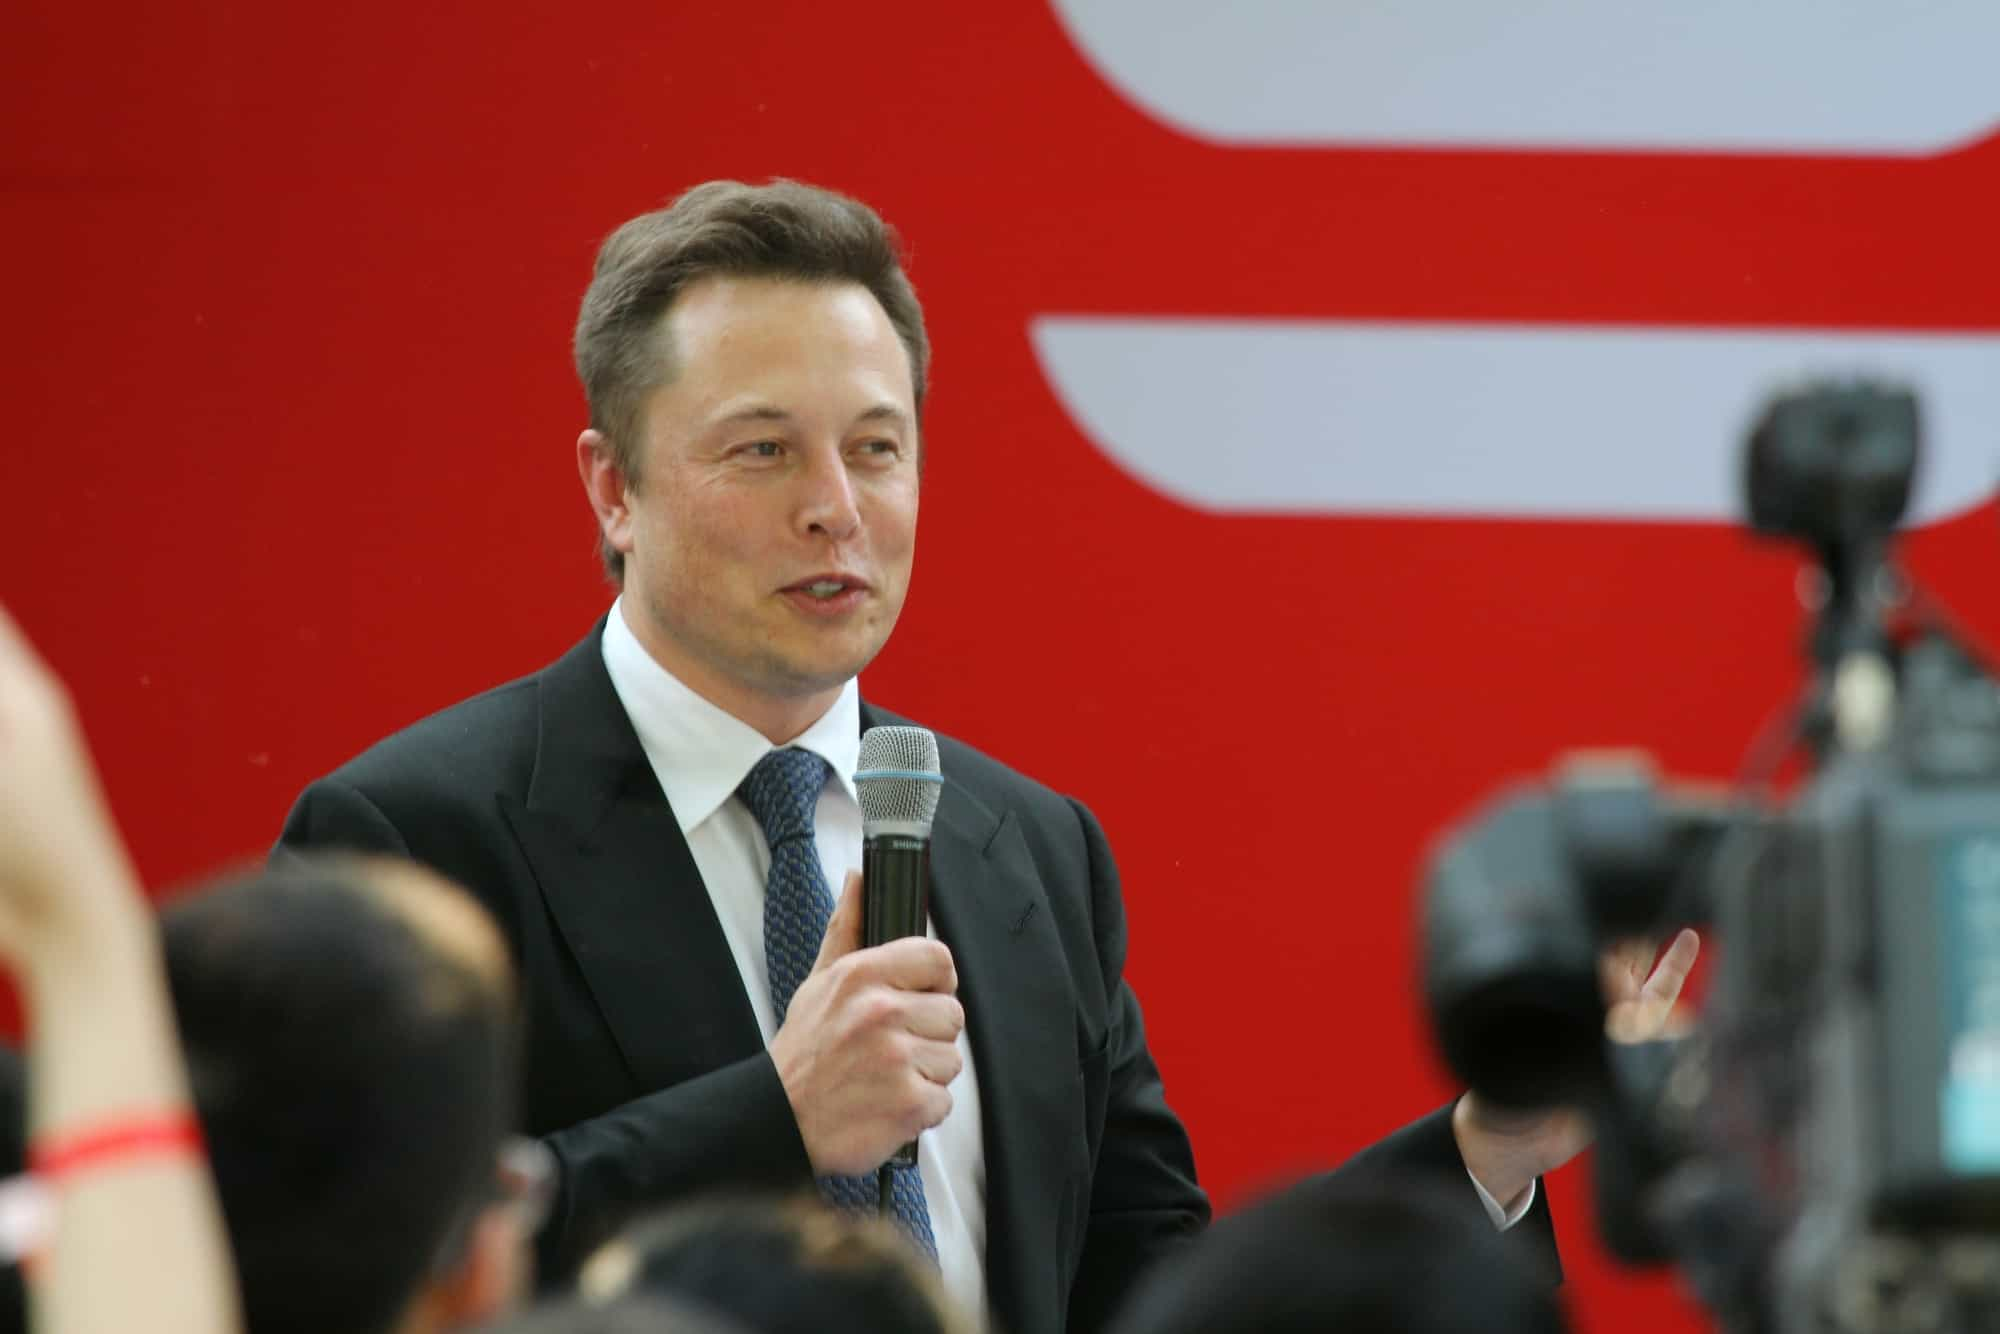 Elon Musk, CEO of Tesla Motors Inc., speaks during a delivery ceremony for Tesla Model S sedan in Beijing, China, 22 April 2014.